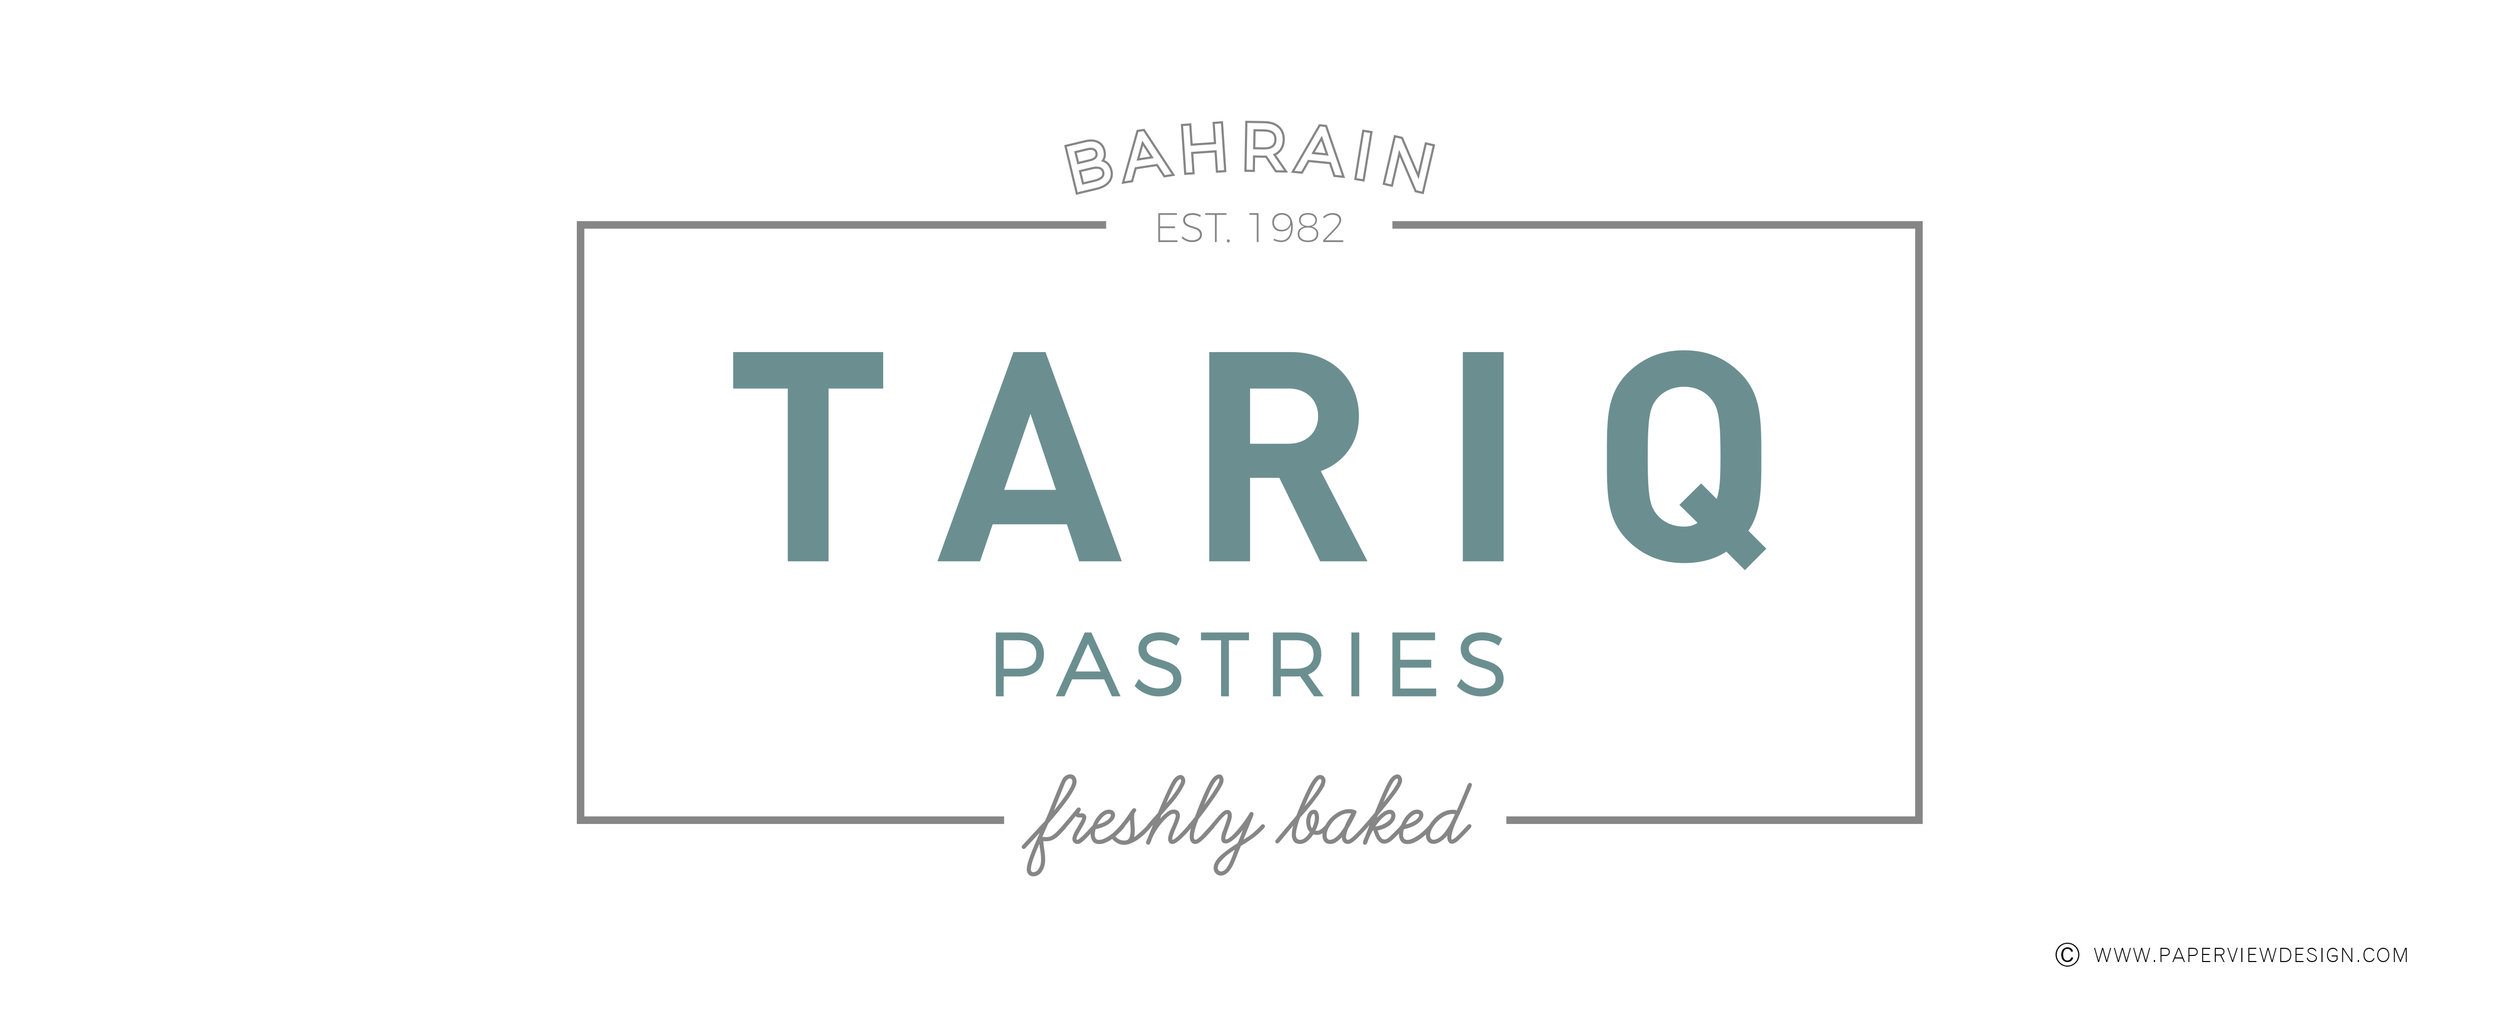 TariqPastries-logo-website.jpg